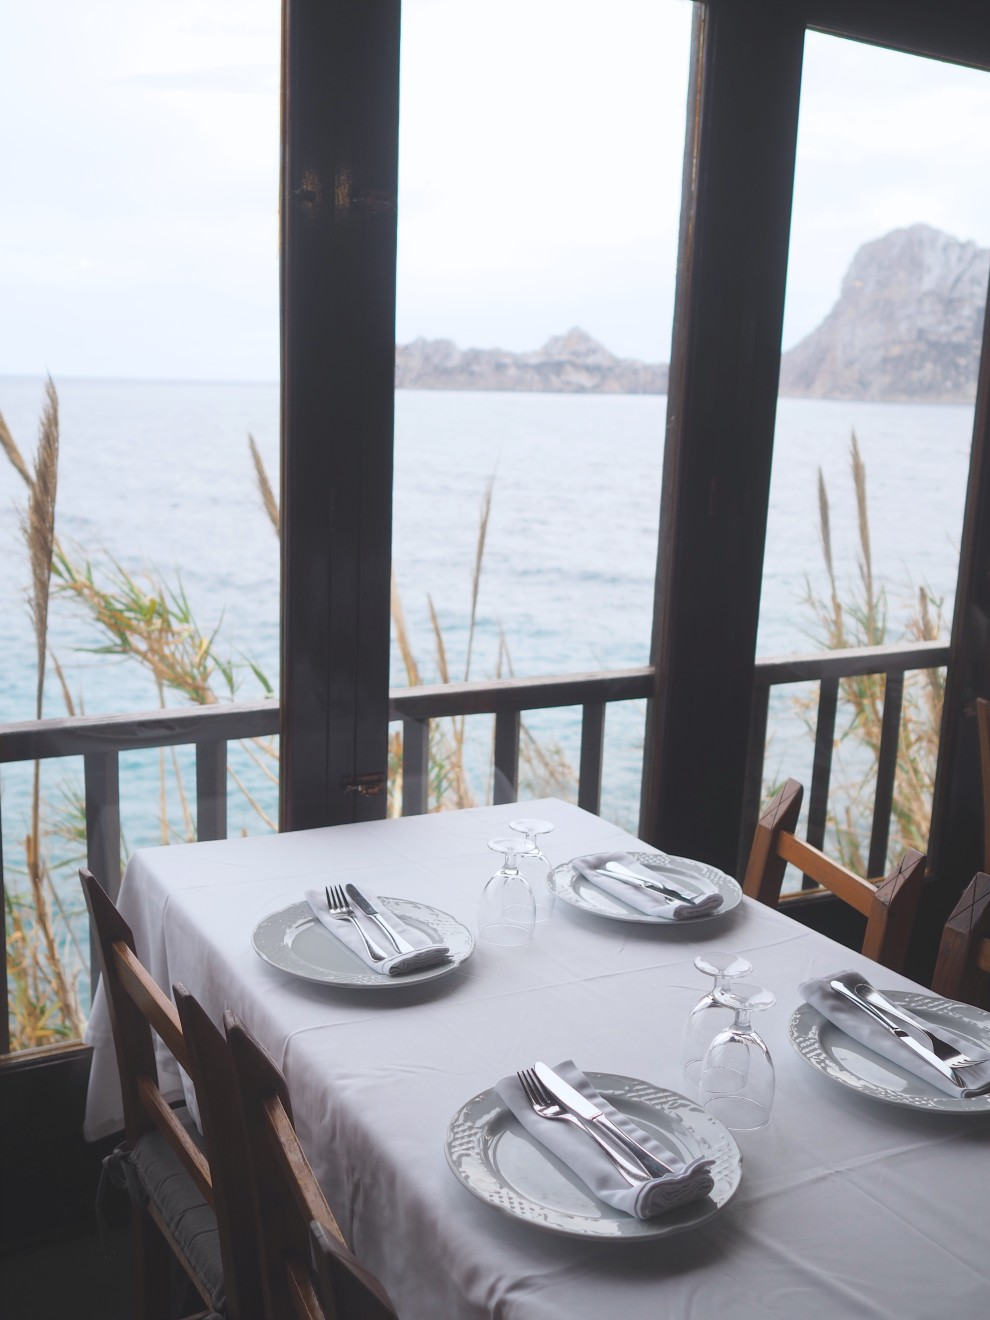 Restaurante Es Boldado – Camí de Cala d'Hort, s/n, –  Sant Josep de sa Talaia